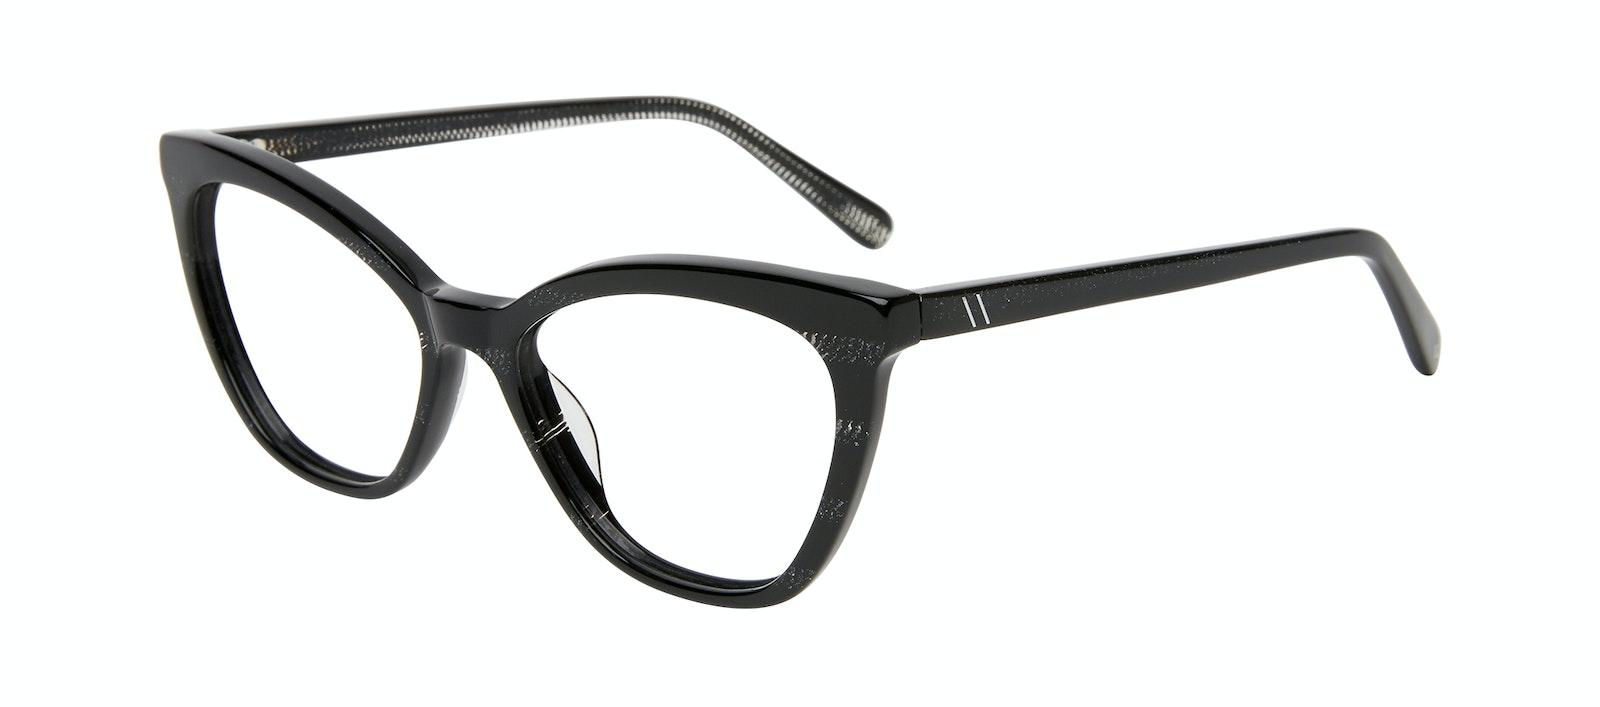 Affordable Fashion Glasses Cat Eye Eyeglasses Women Elan Night Tilt